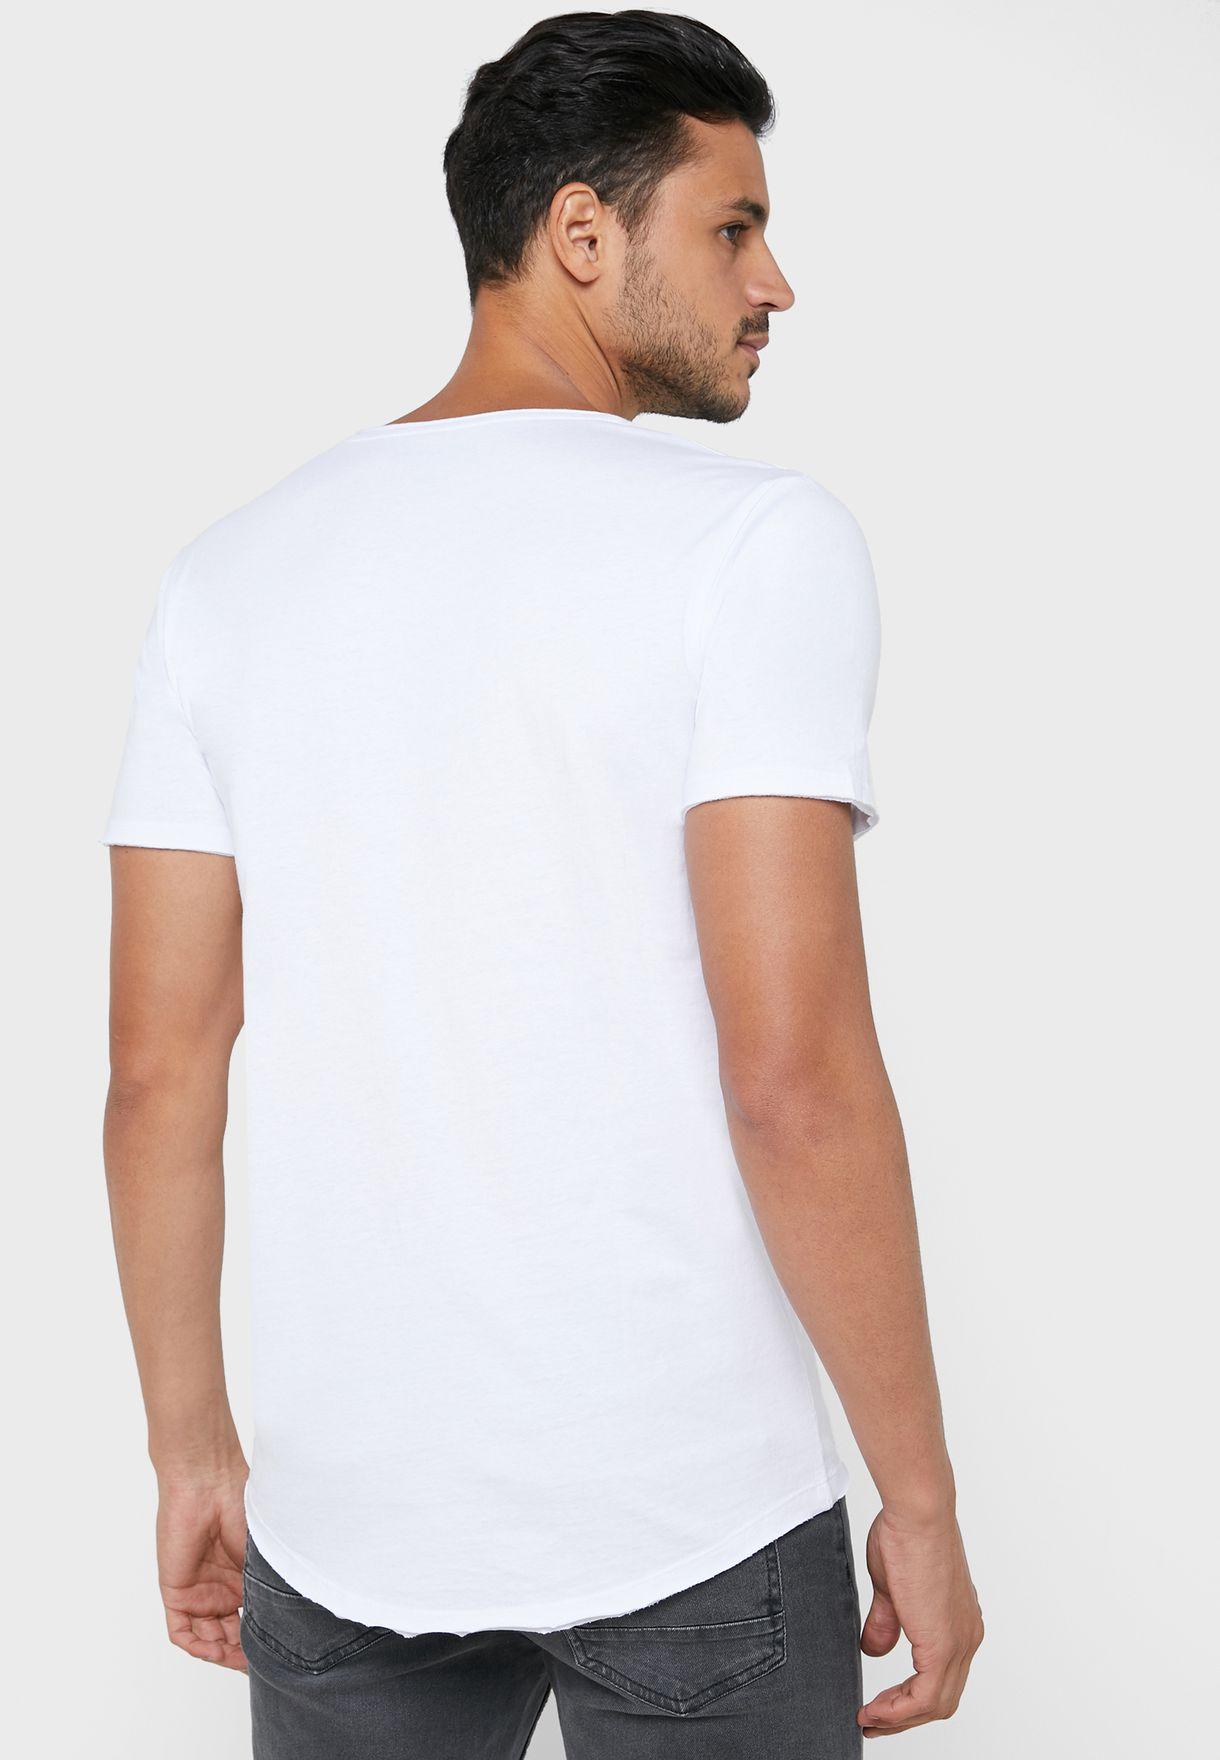 Moulder Crew Neck T-Shirt